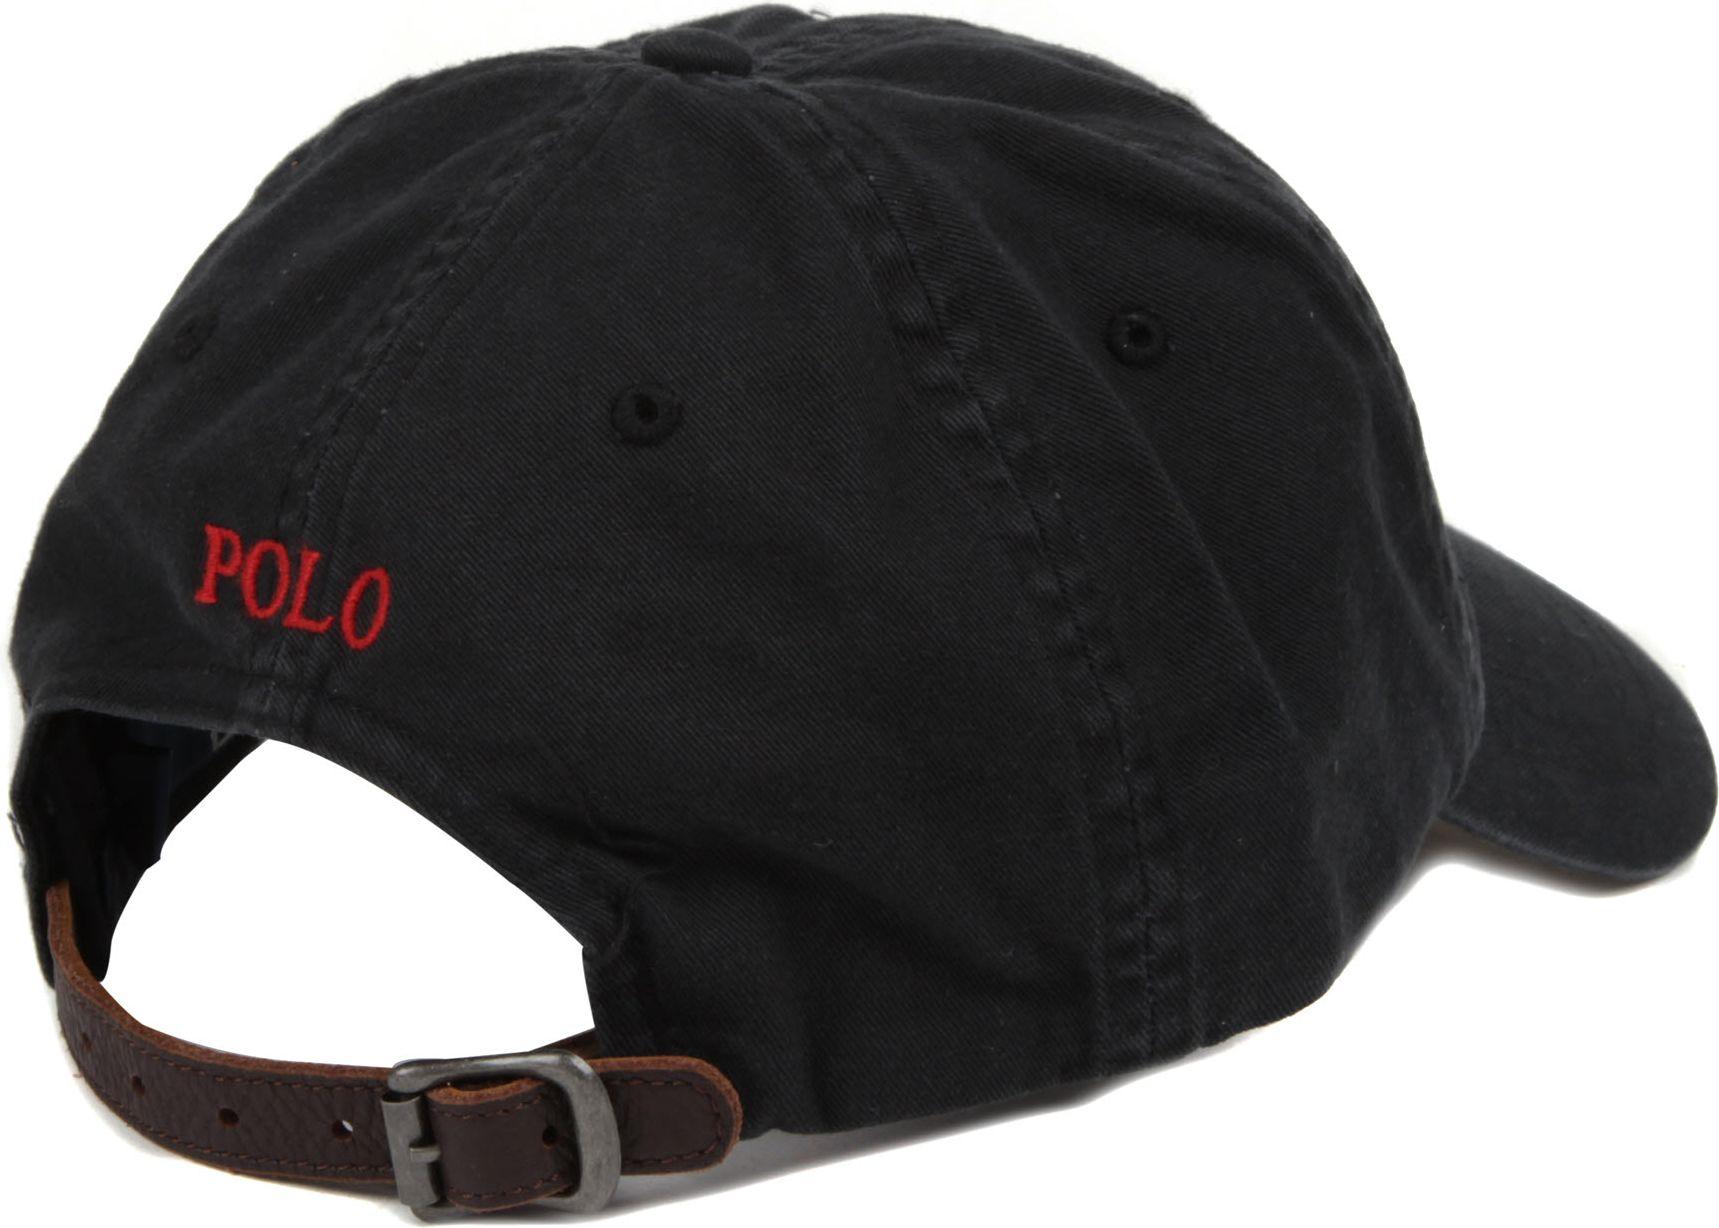 ralph lauren signature pony baseball cap in black for men. Black Bedroom Furniture Sets. Home Design Ideas